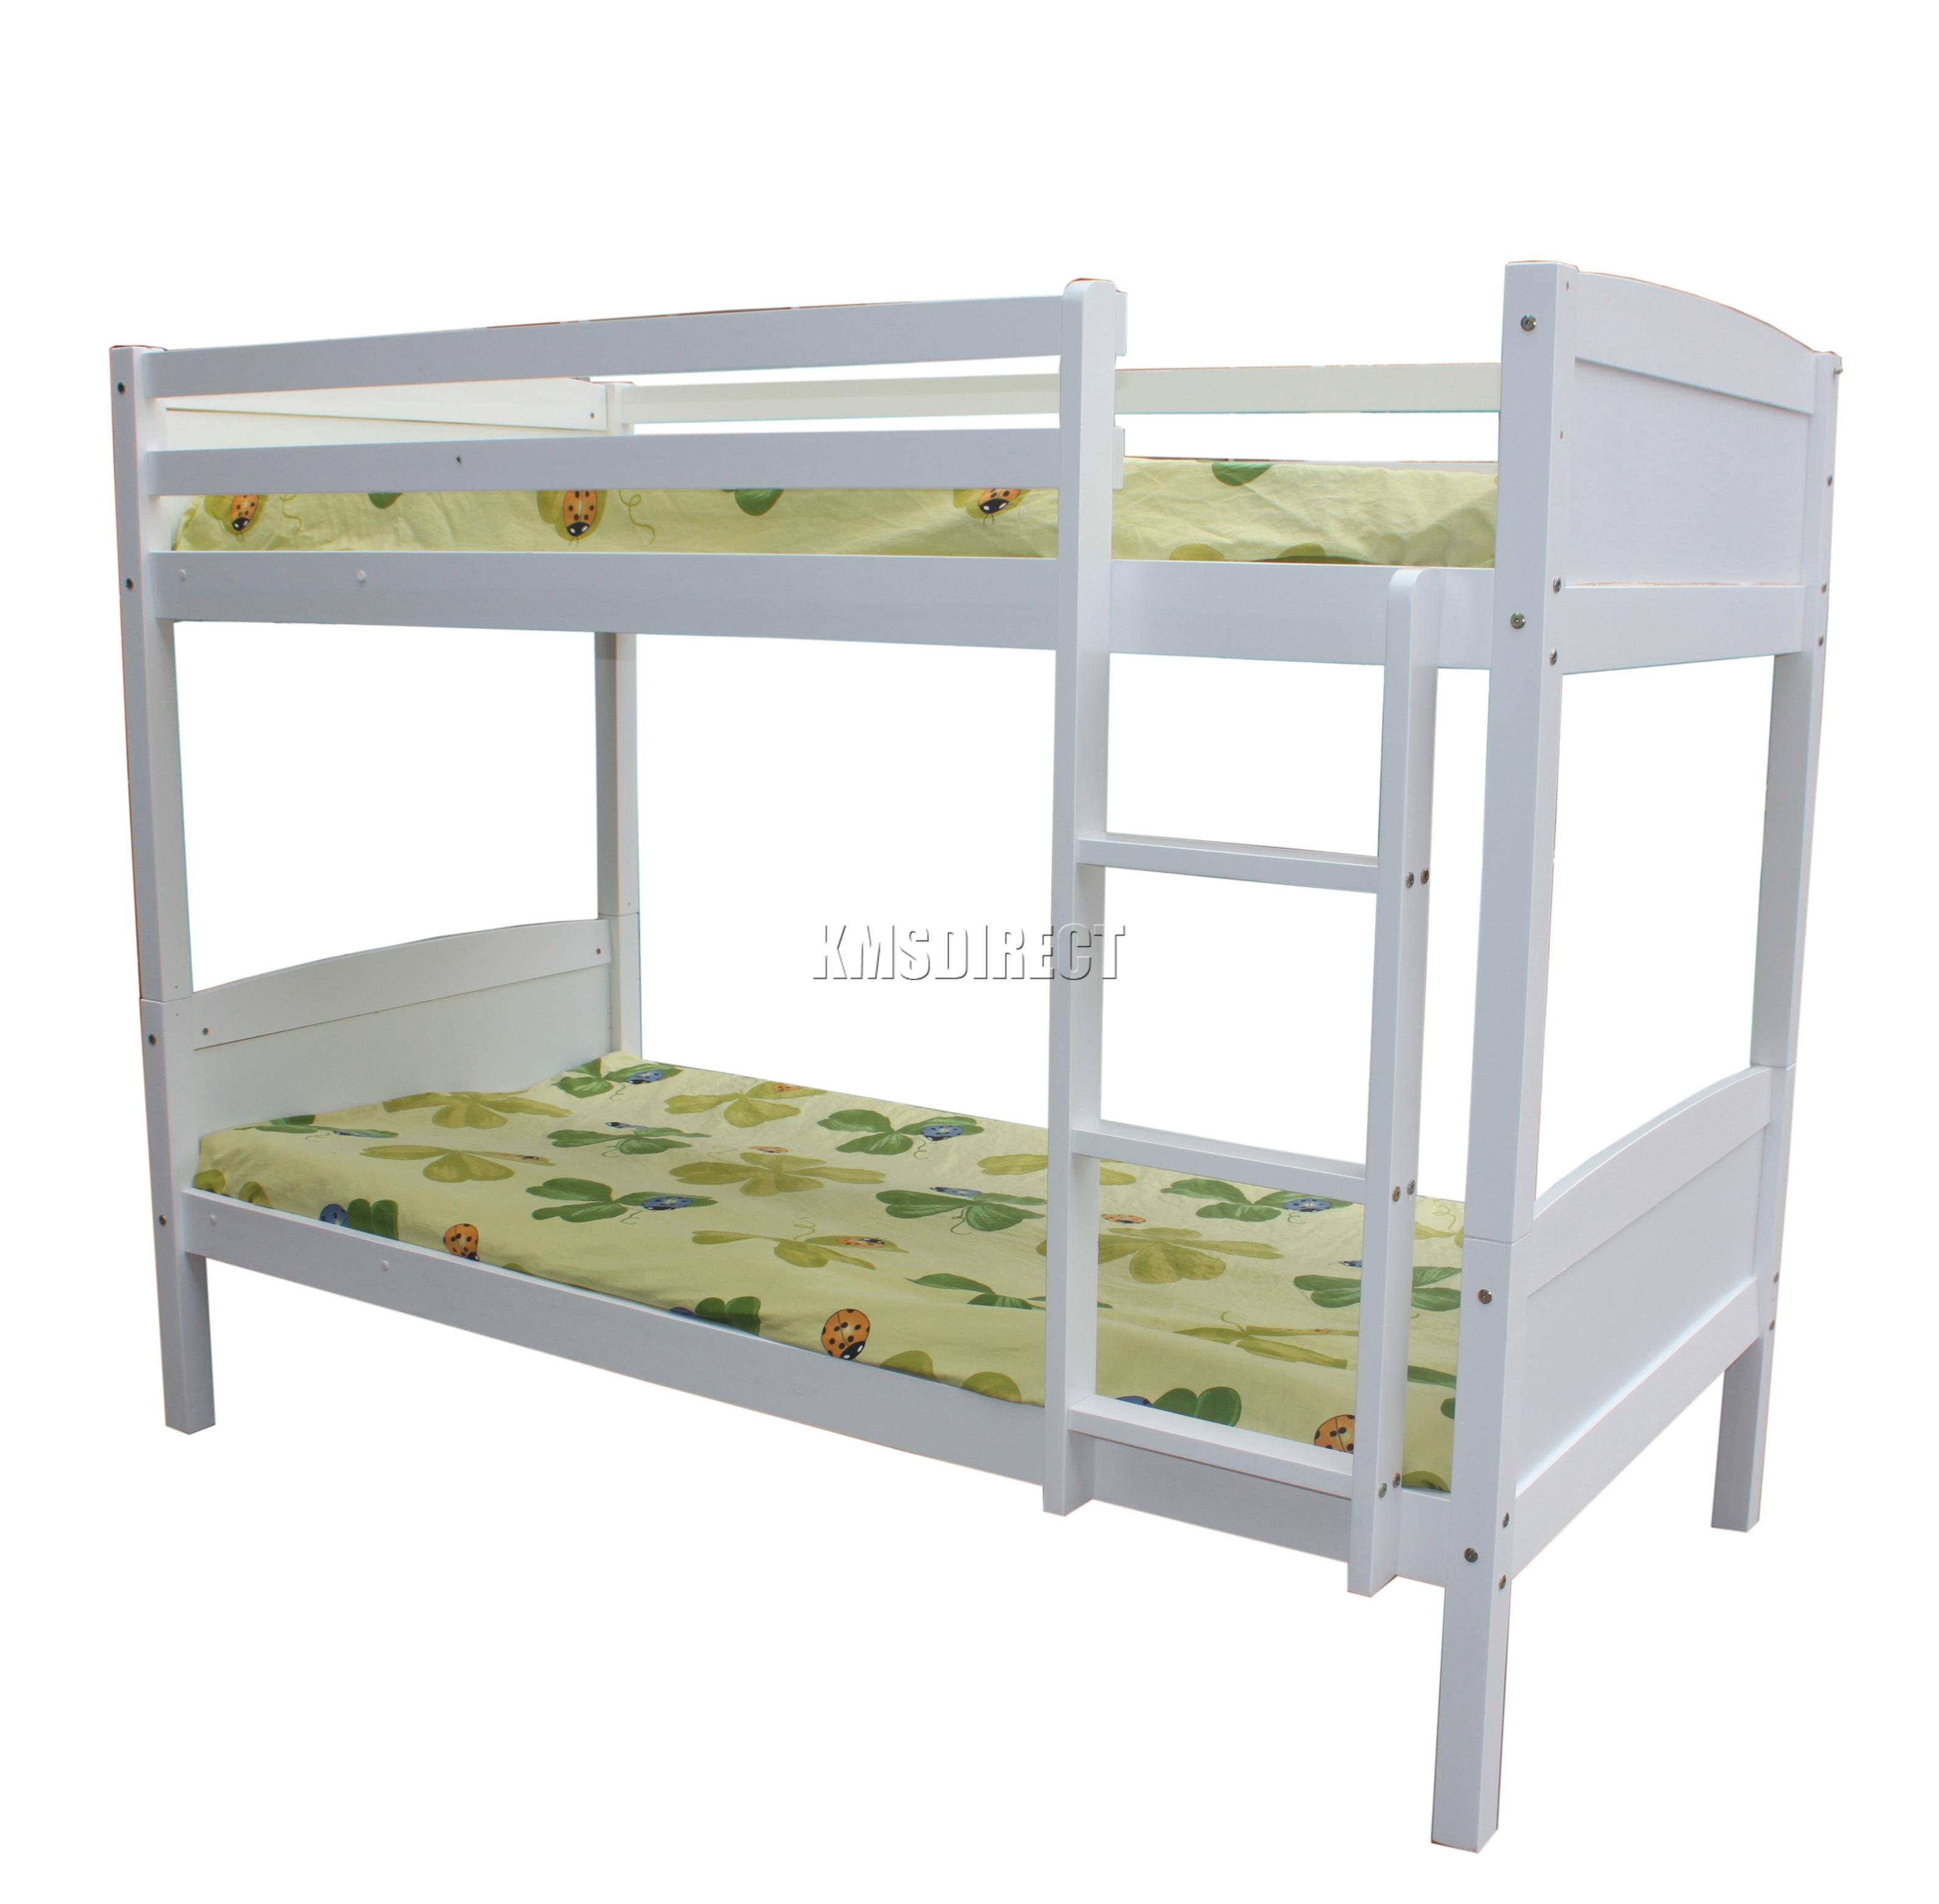 Foxhunter bunk bed 3ft wood wooden frame children sleeper for Single bunk bed frame